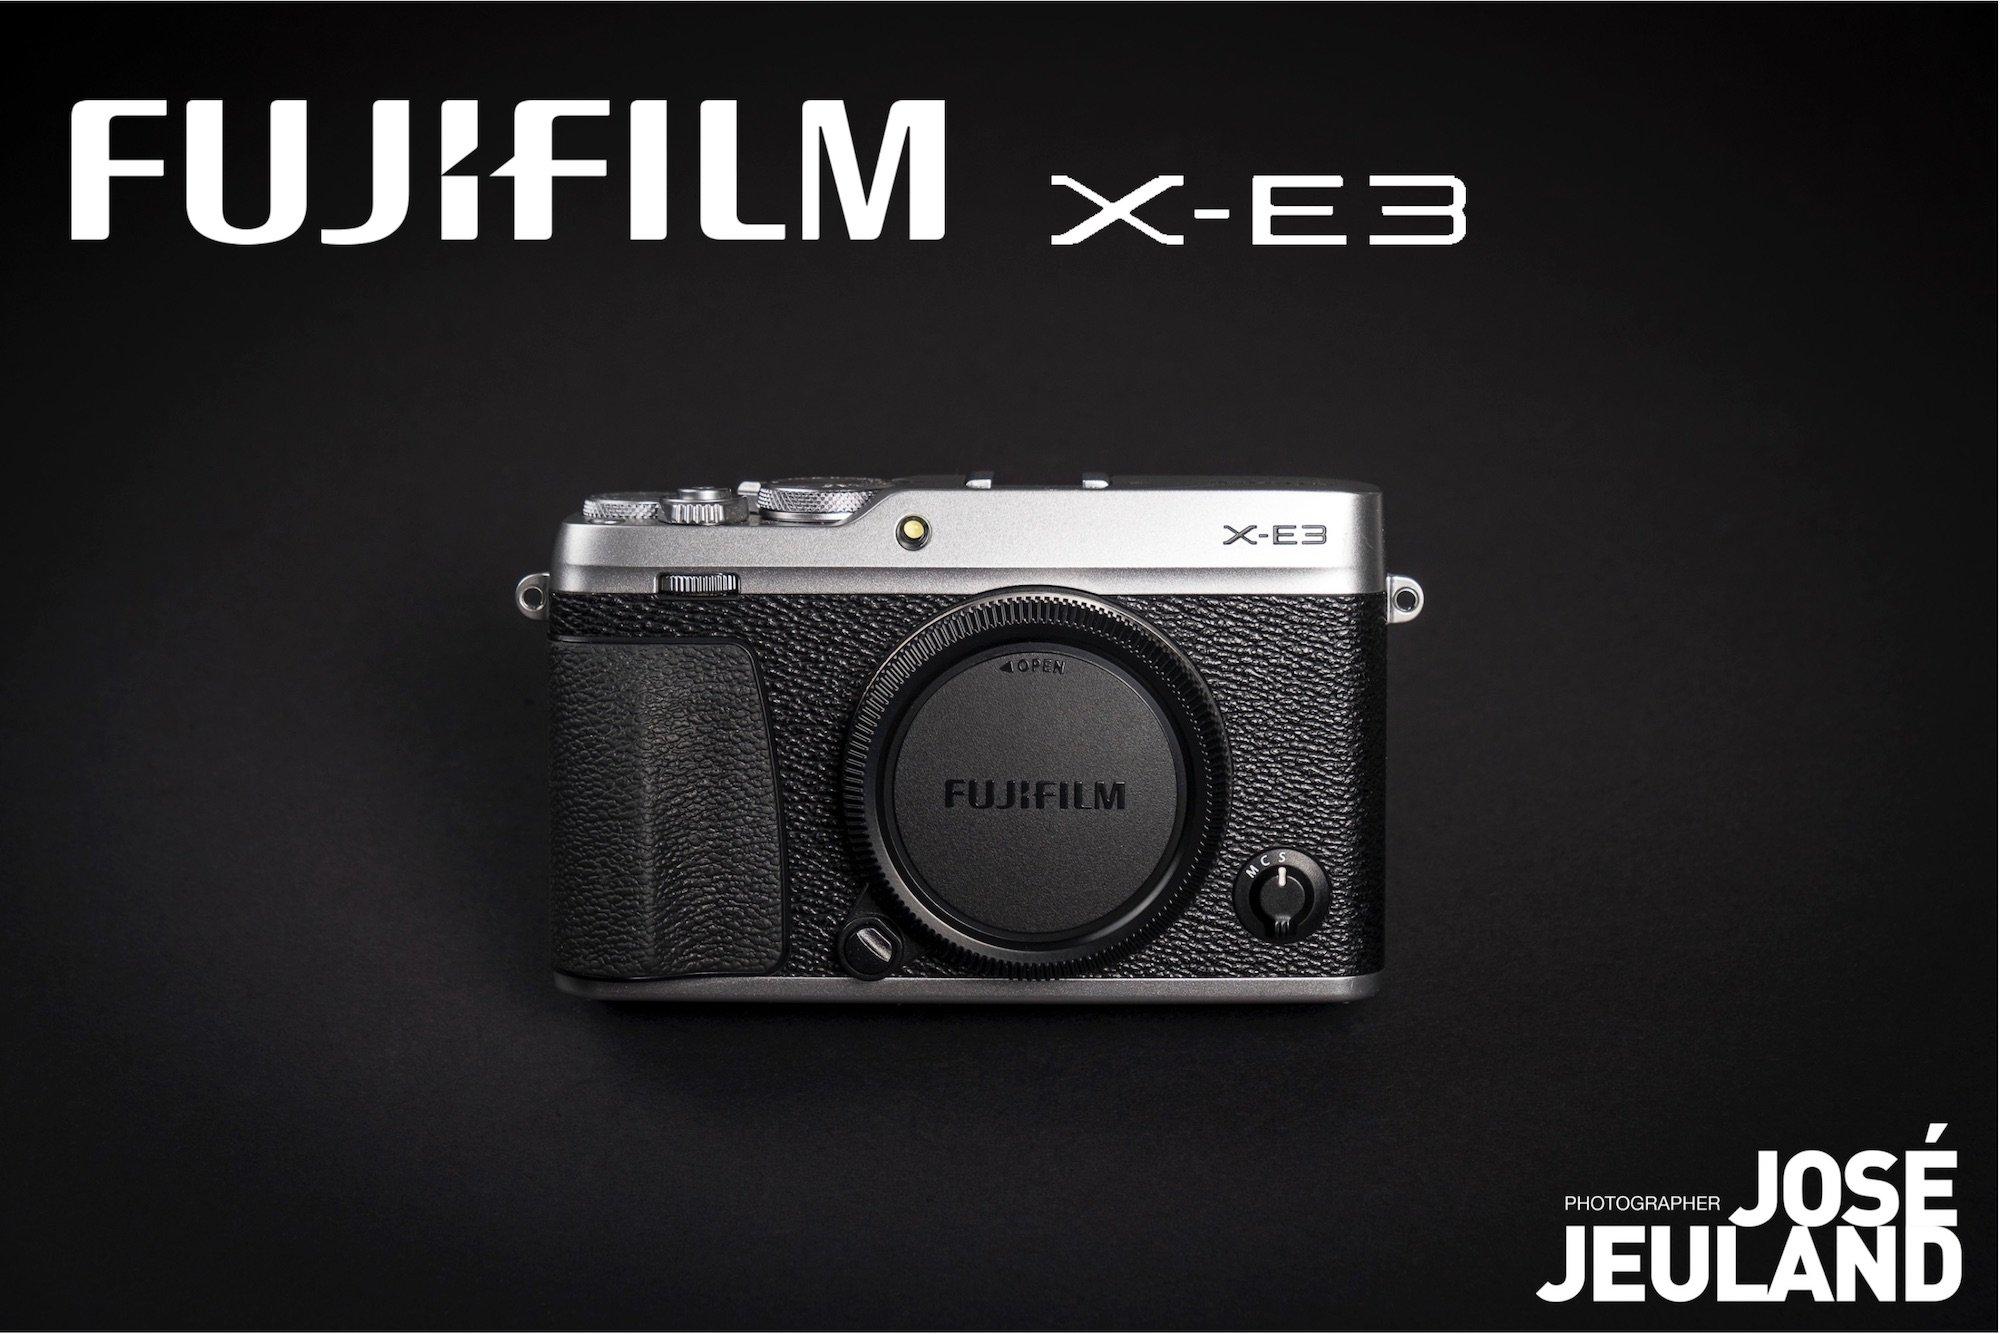 FUJIFILM X-E3 photo camera - Jose Jeuland web